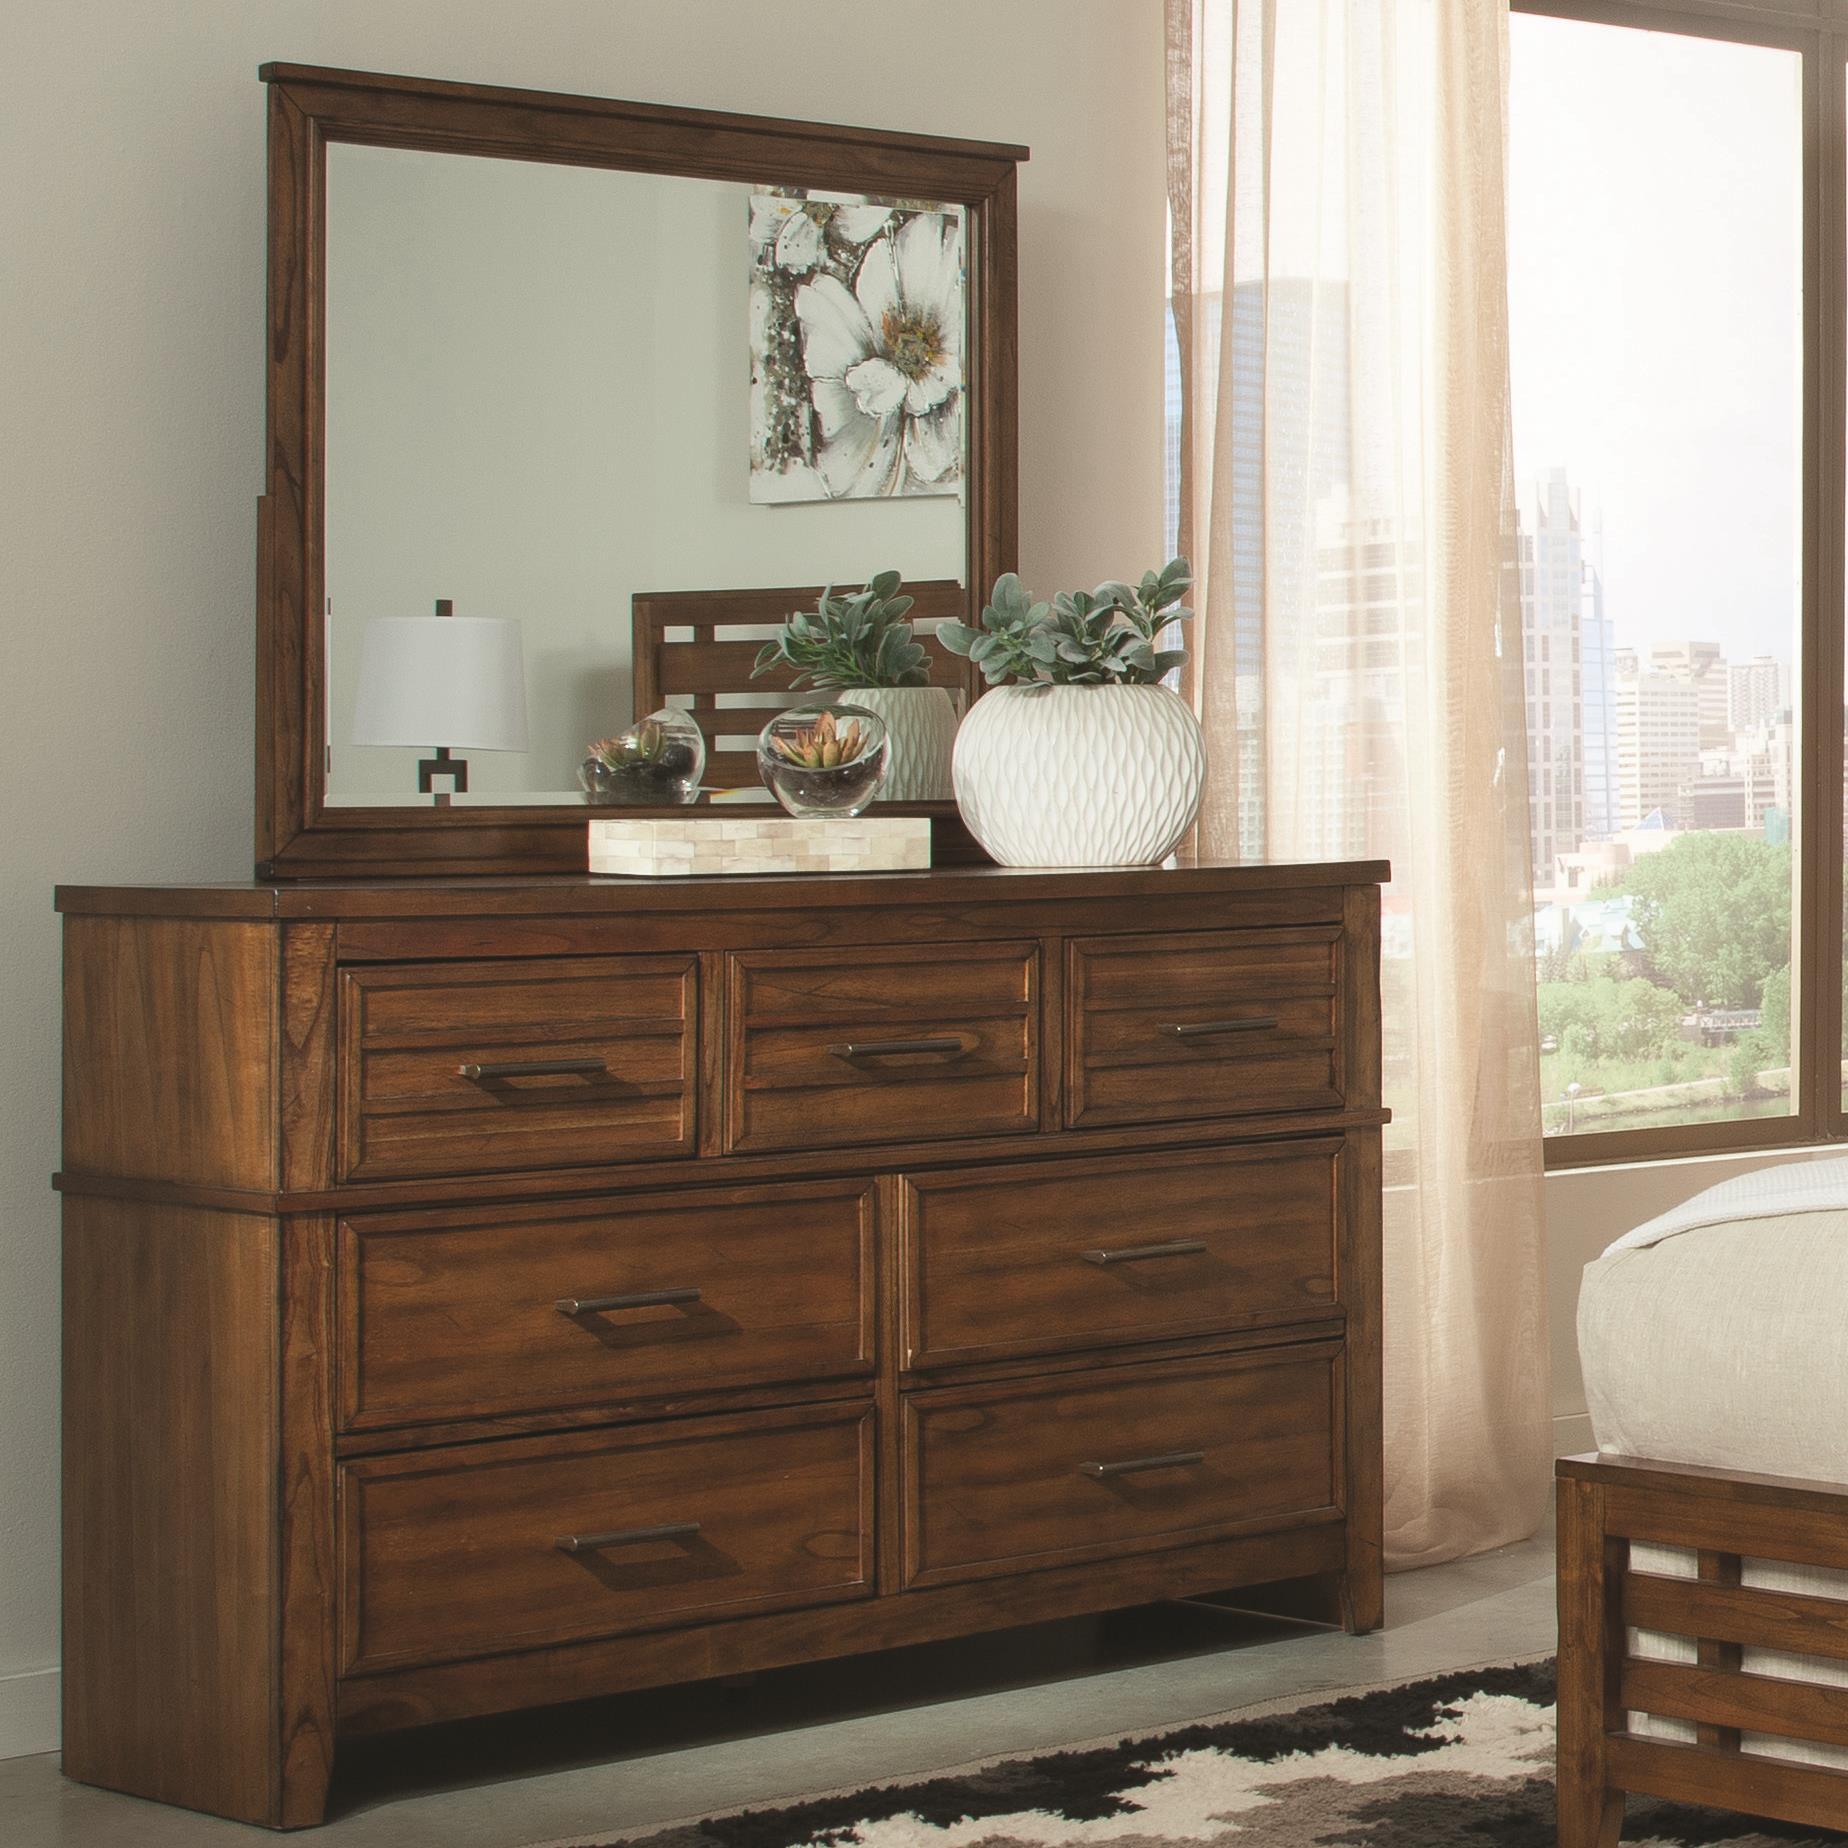 Coaster Cupertino Dresser & Mirror Set - Item Number: 204023+24